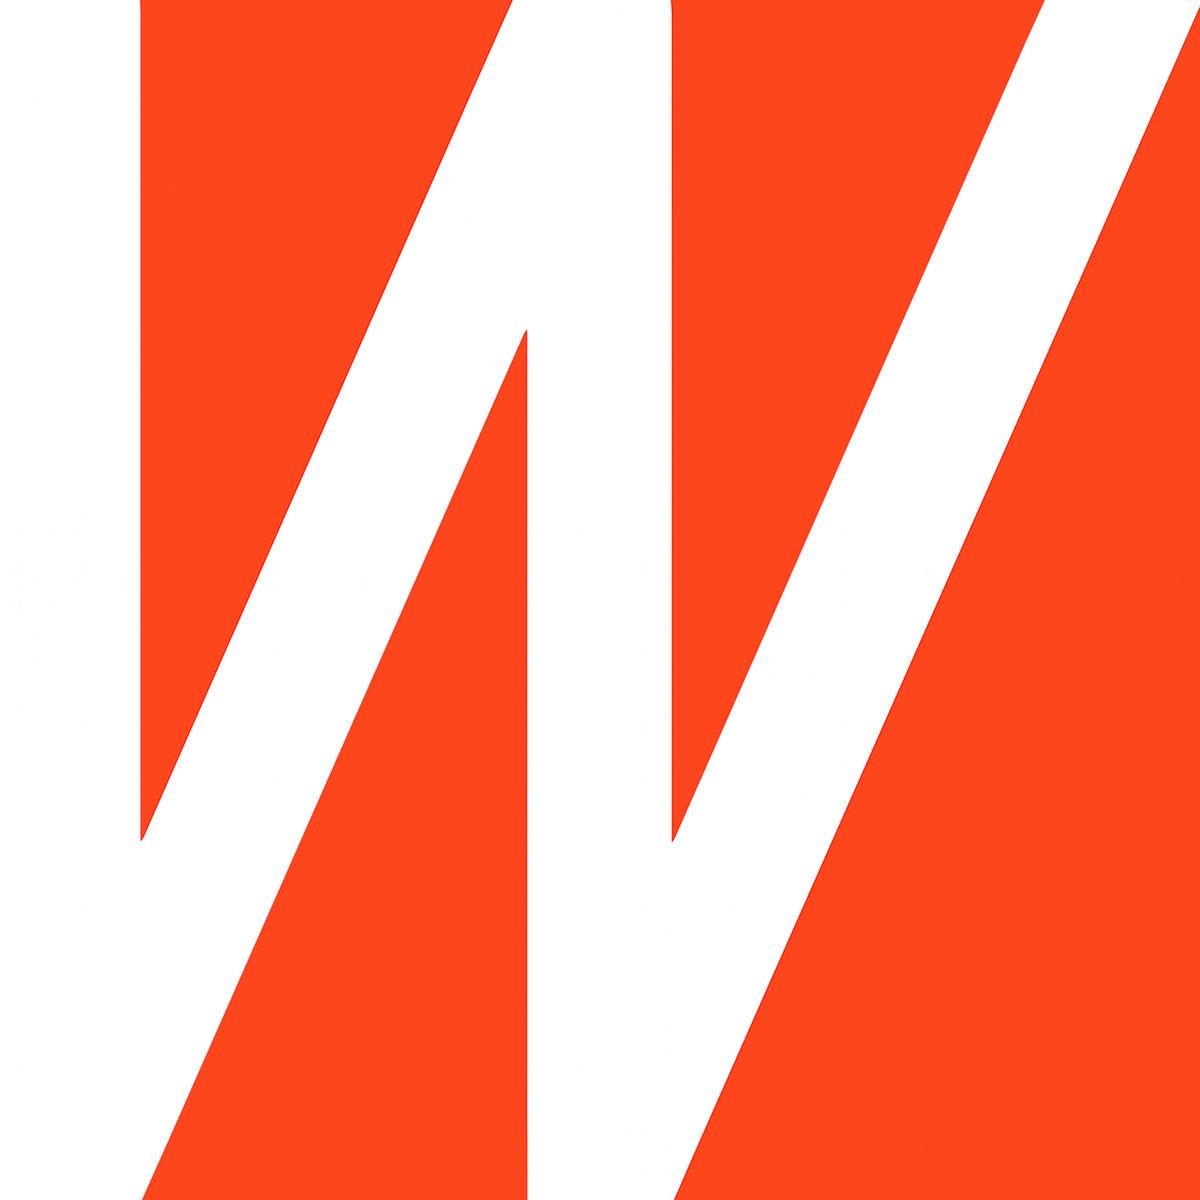 WerkWk.1 - Released: 22-JUNE-2015Catalogue: IHMR XIFormats: Tape, CD, Digital